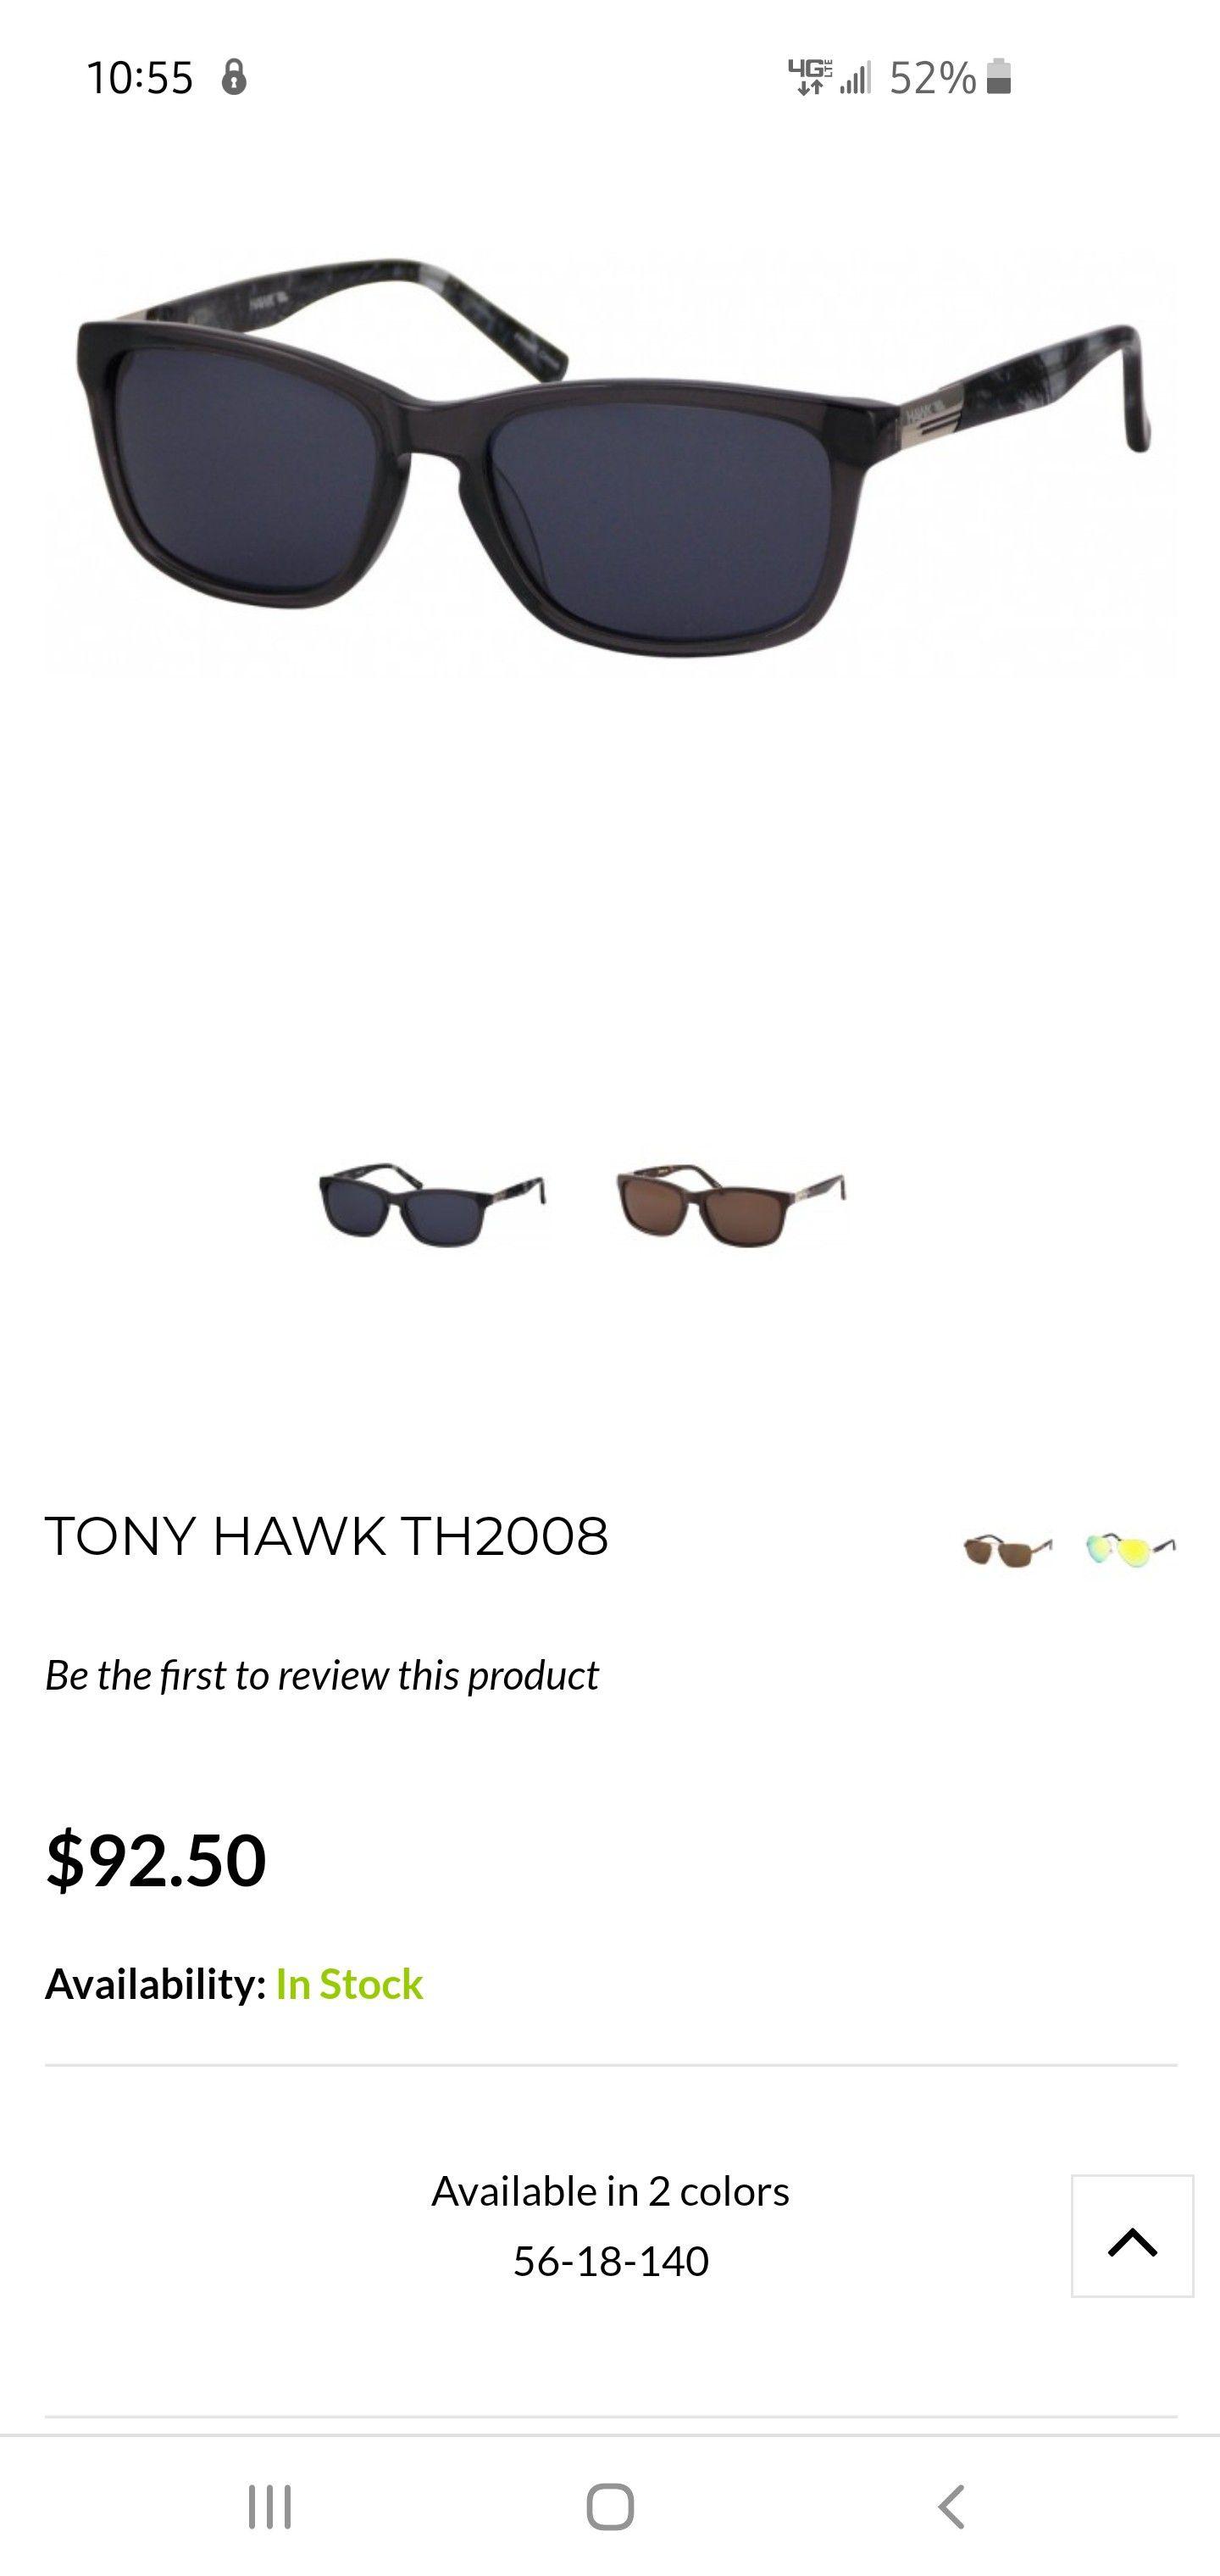 Tony Hawk Designer Sunglasses model TH2008